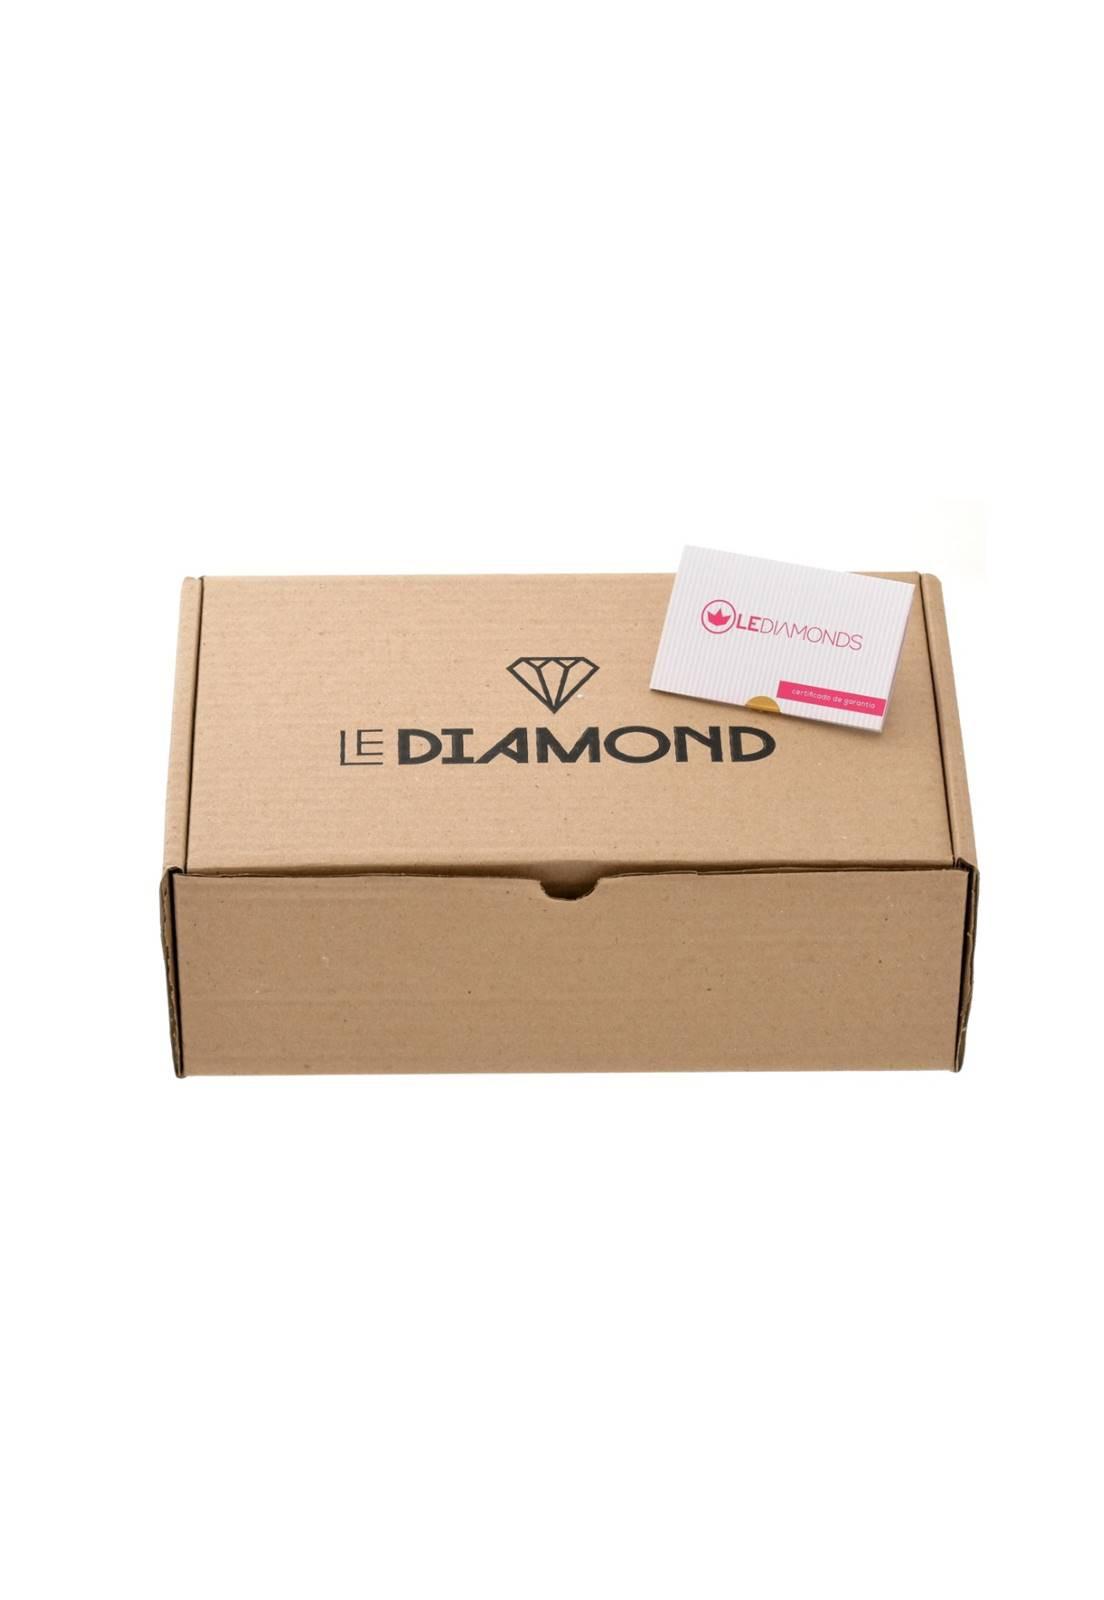 Colar Choker Le Diamond com Aro Dourado